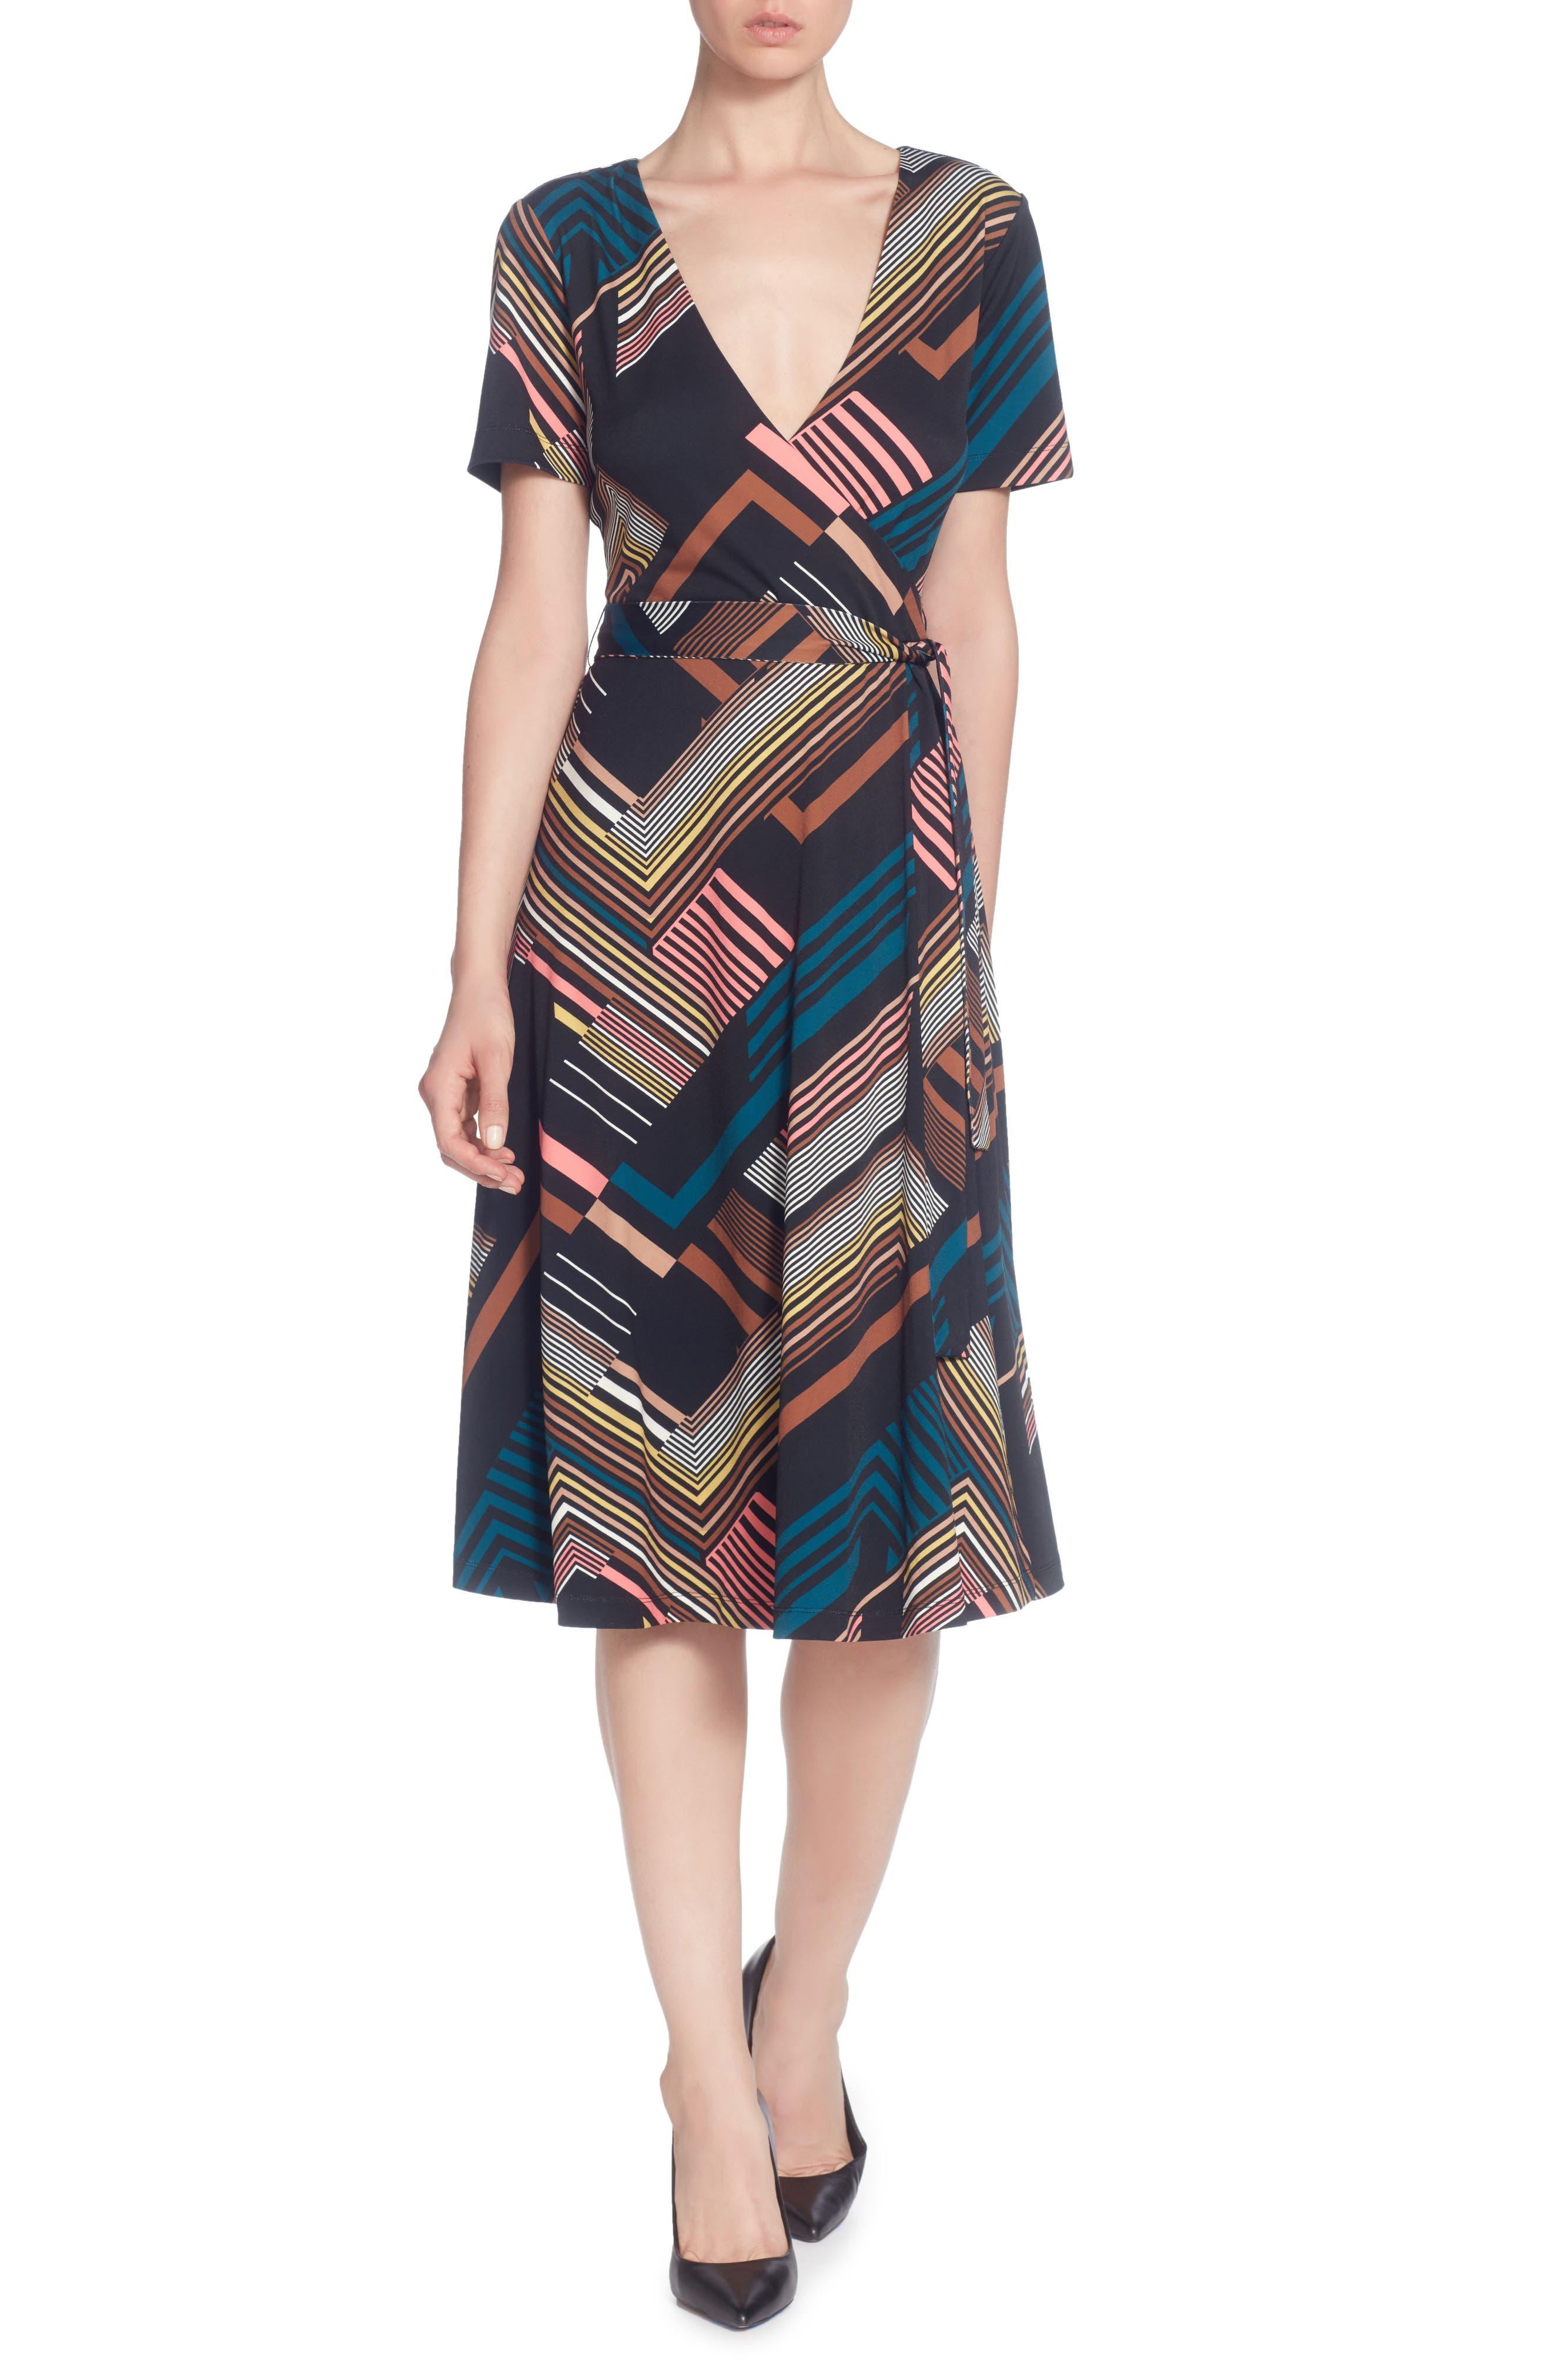 Taral Print Faux Wrap Dress,                         Main,                         color, 001